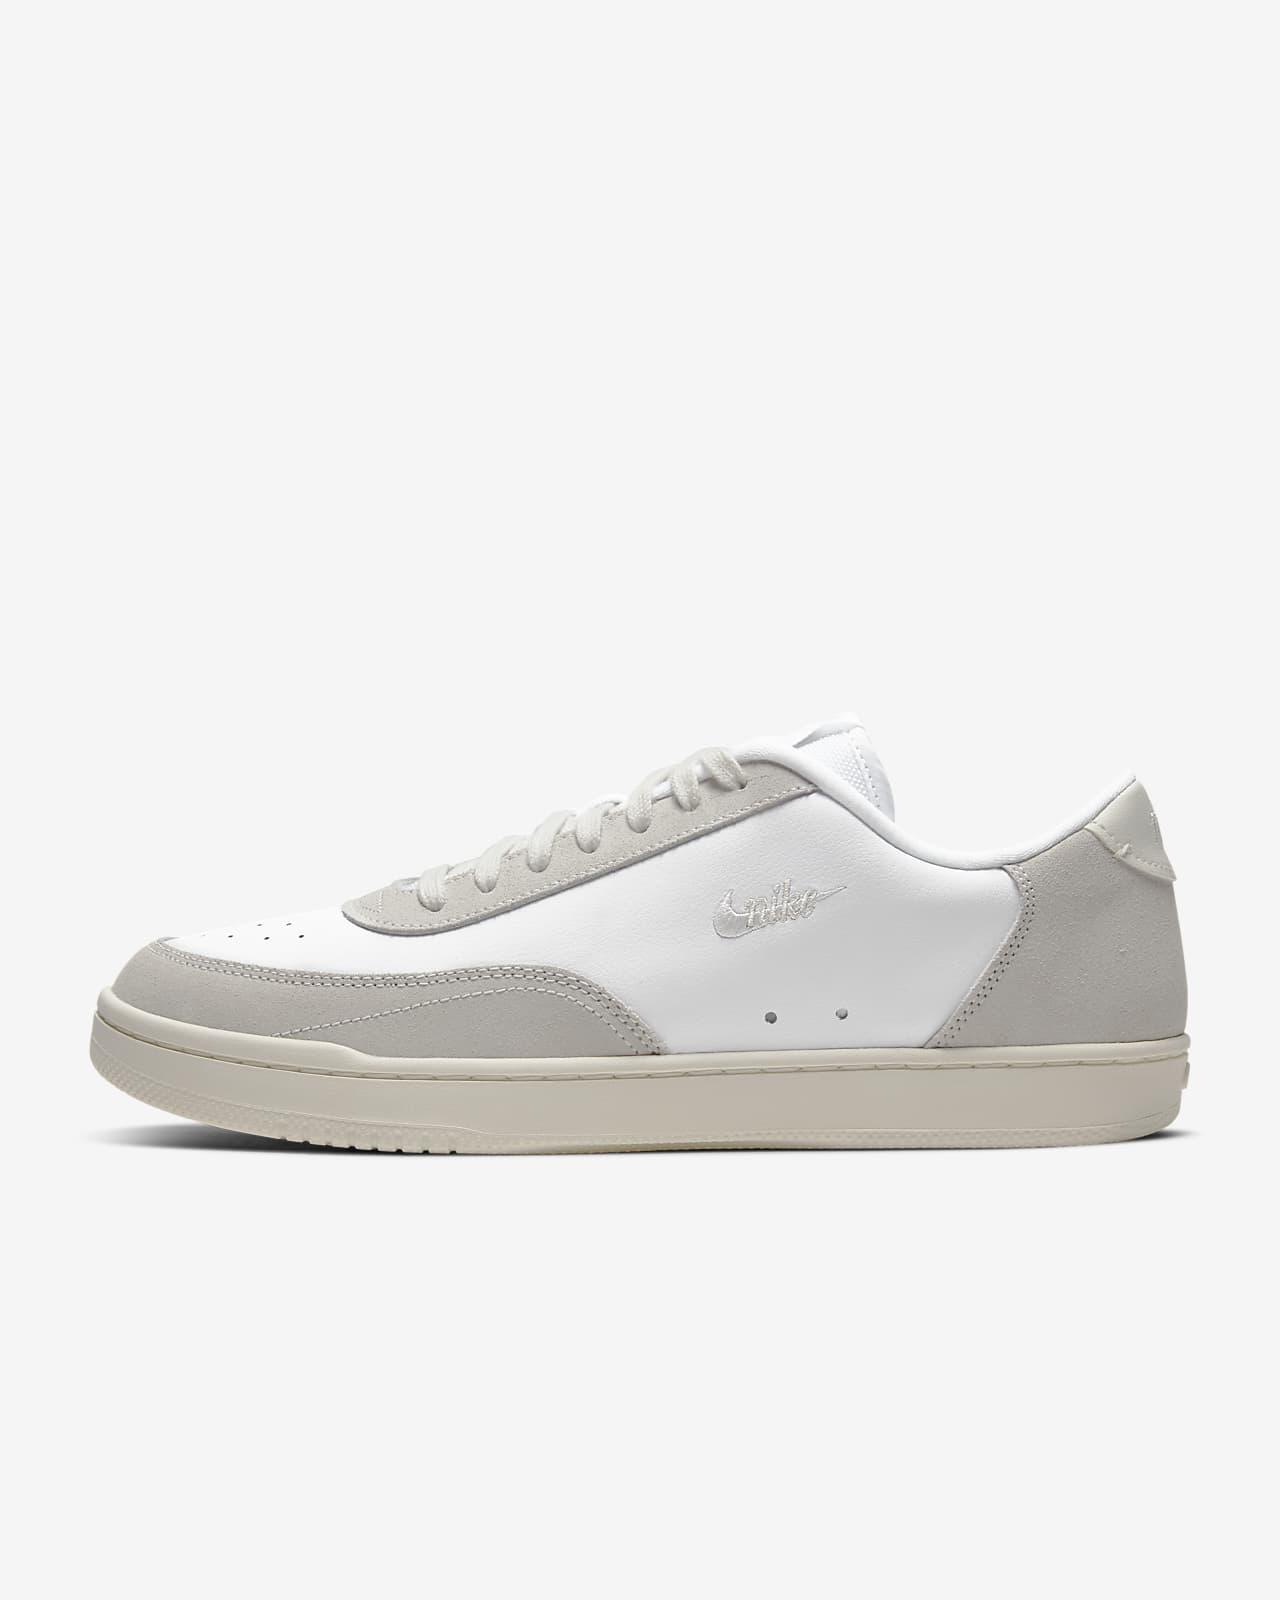 nike chaussure vintage